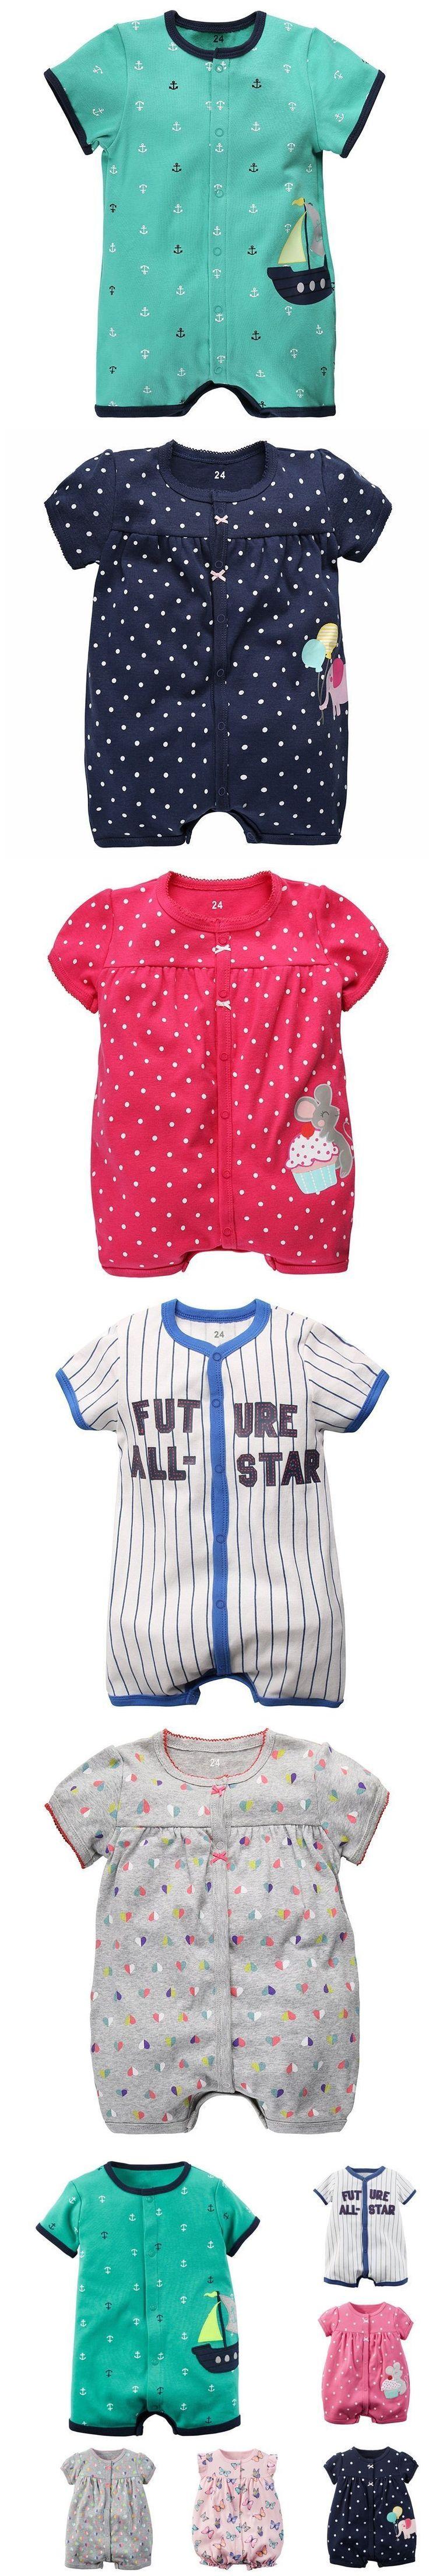 1497 best baby girl shorts images on Pinterest